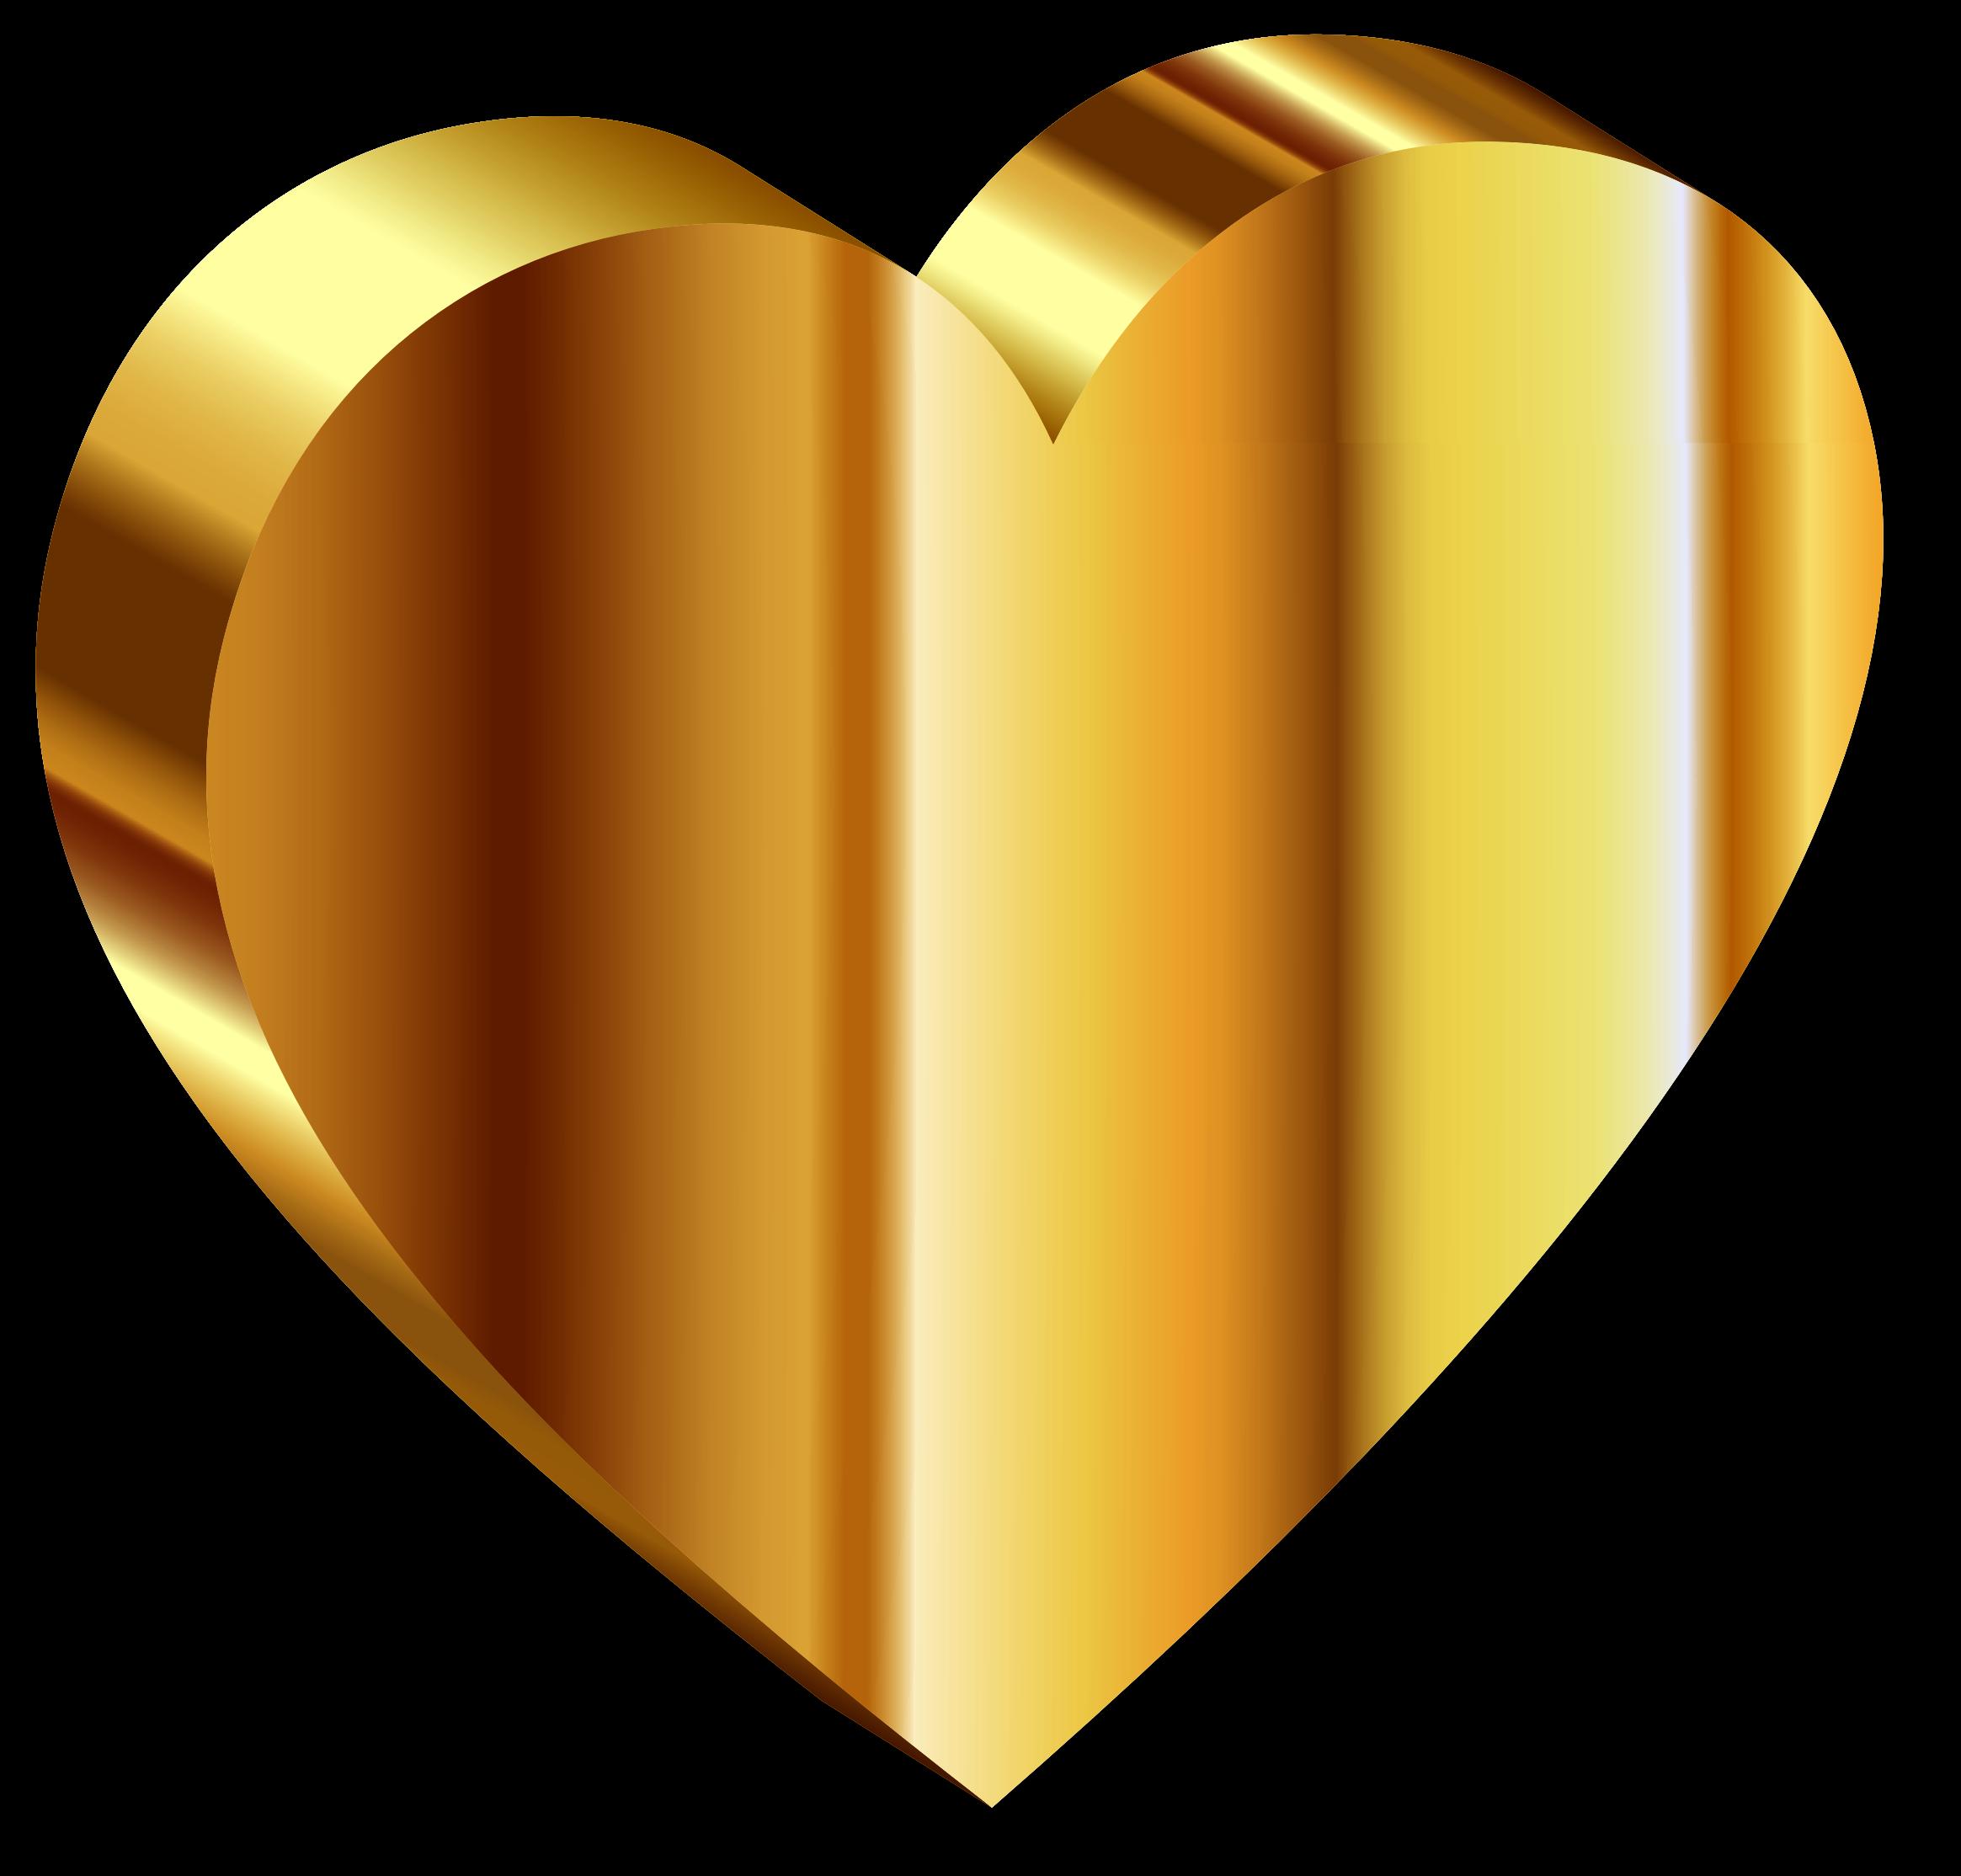 Gold heart png image. Dust clipart orange